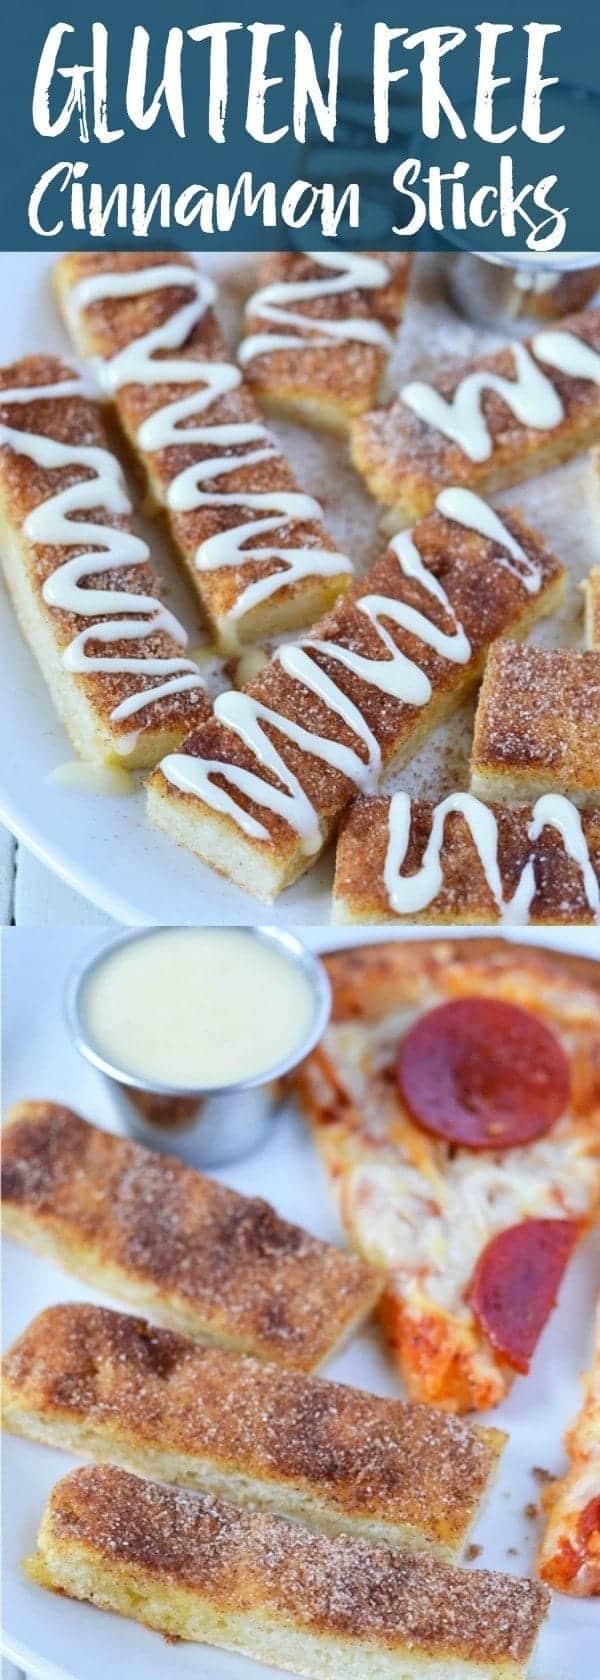 Gluten Free Cinnamon Sticks with cream cheese icing (dairy free). Recipe from @whattheforkblog | whattheforkfoodblog.com